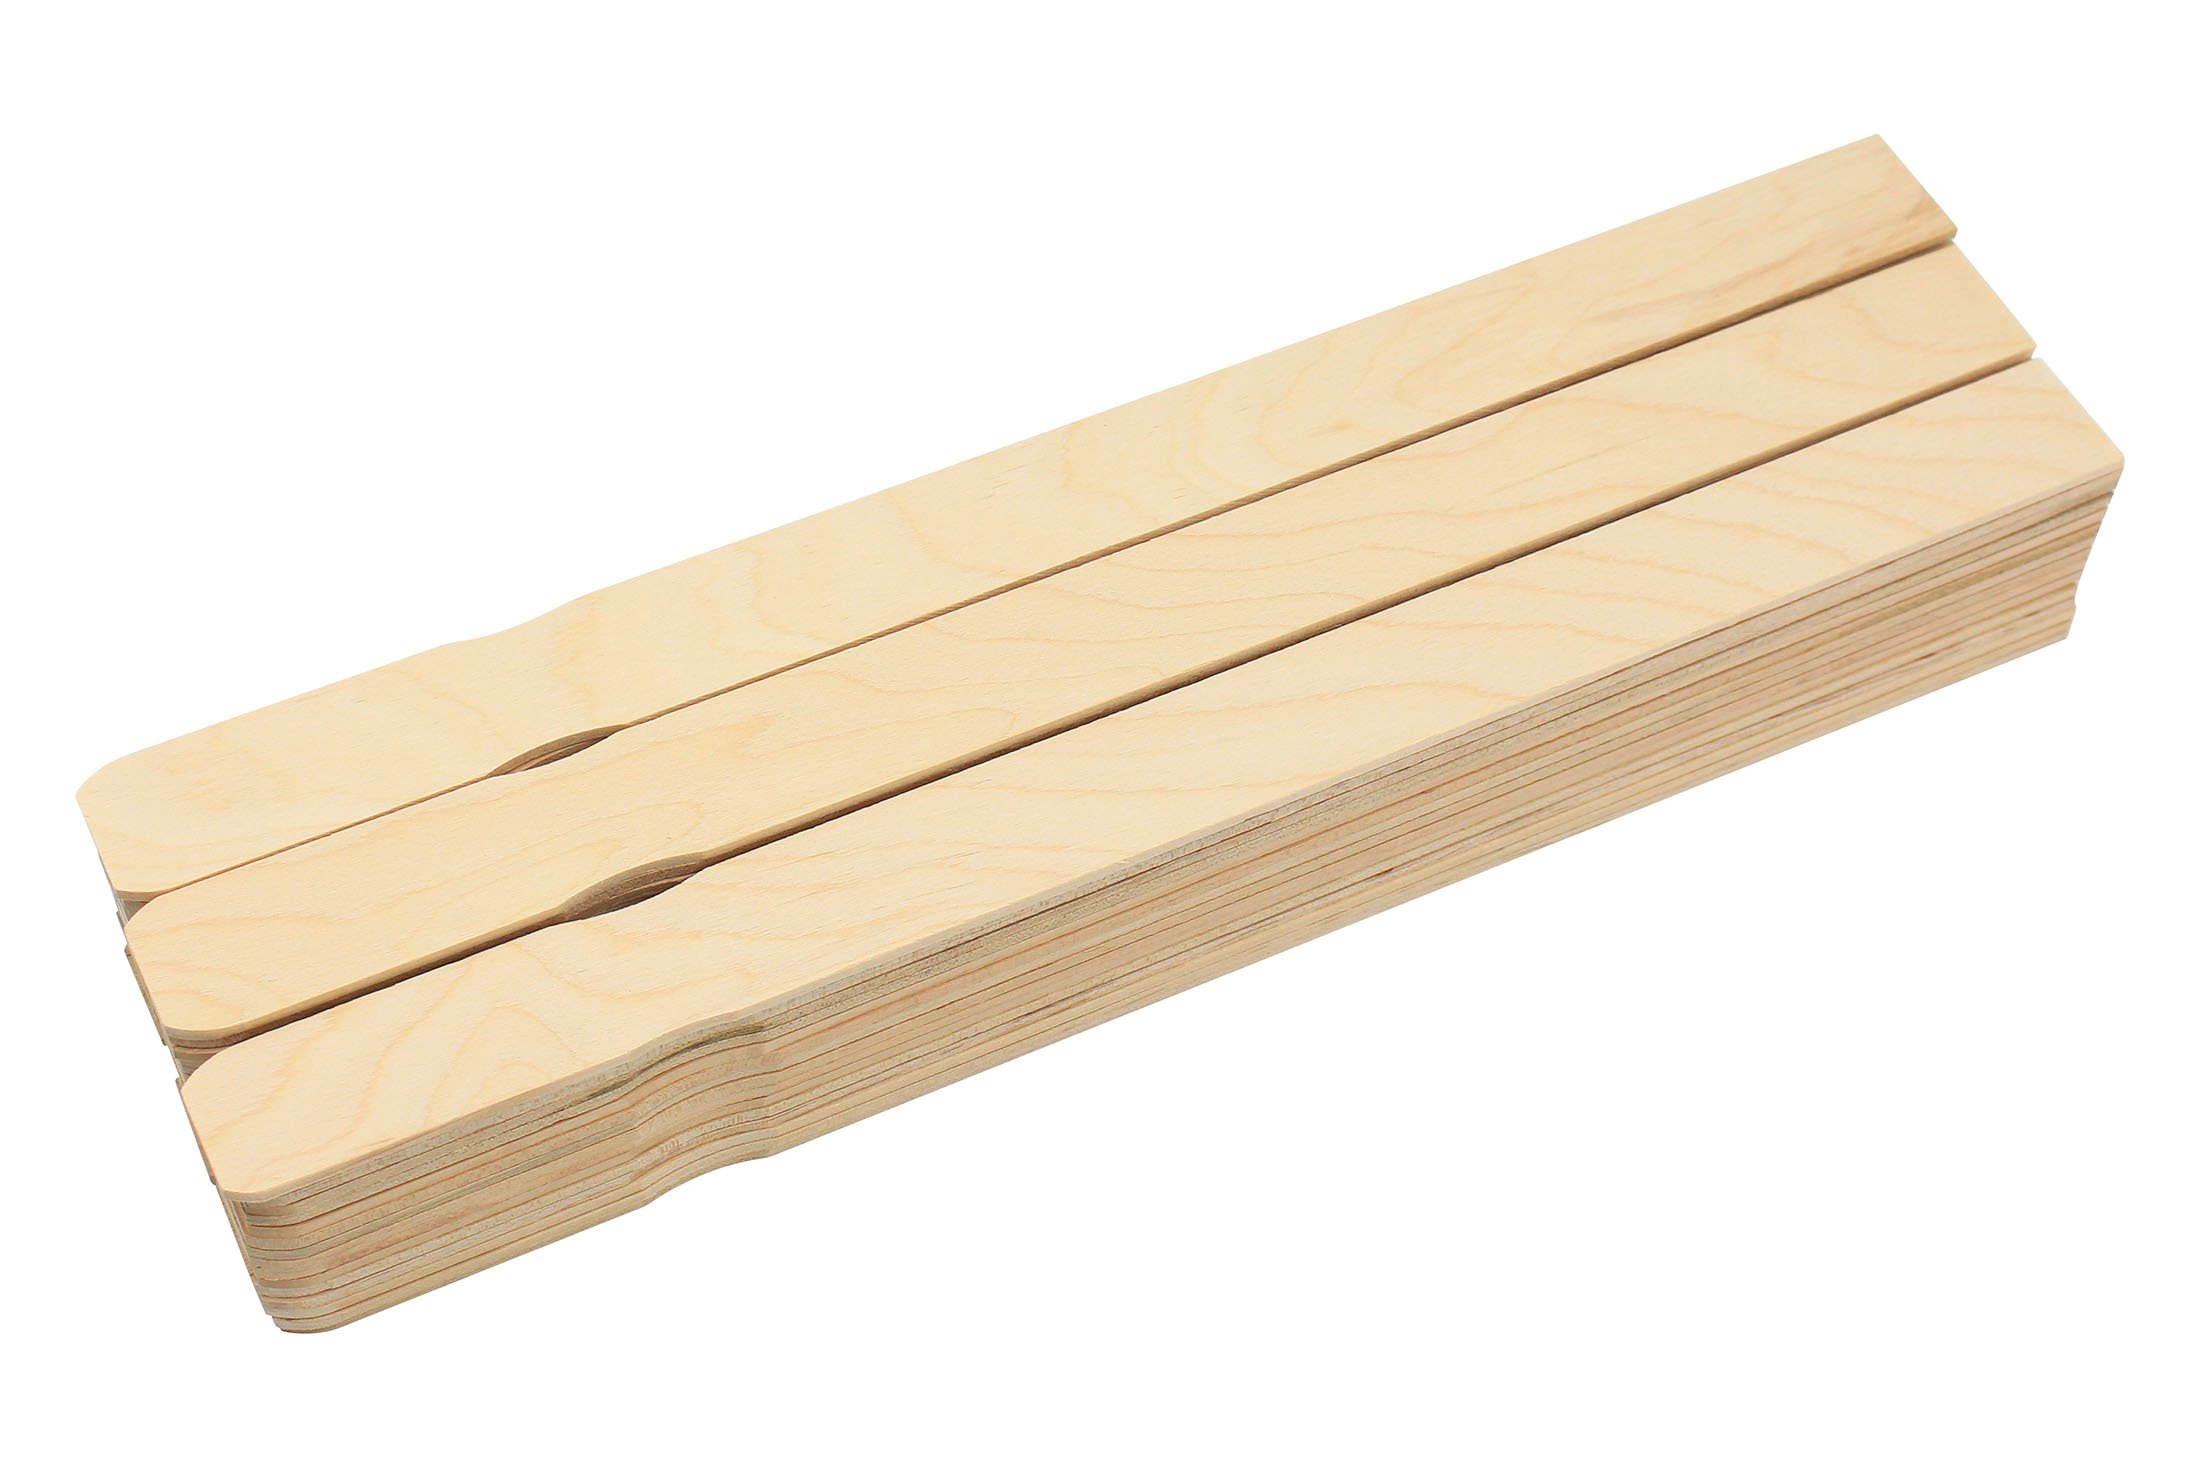 Birchwood Paint Stir Sticks Mixer Paddles 14 Inch Wood Crafts Bulk 50 Pcs